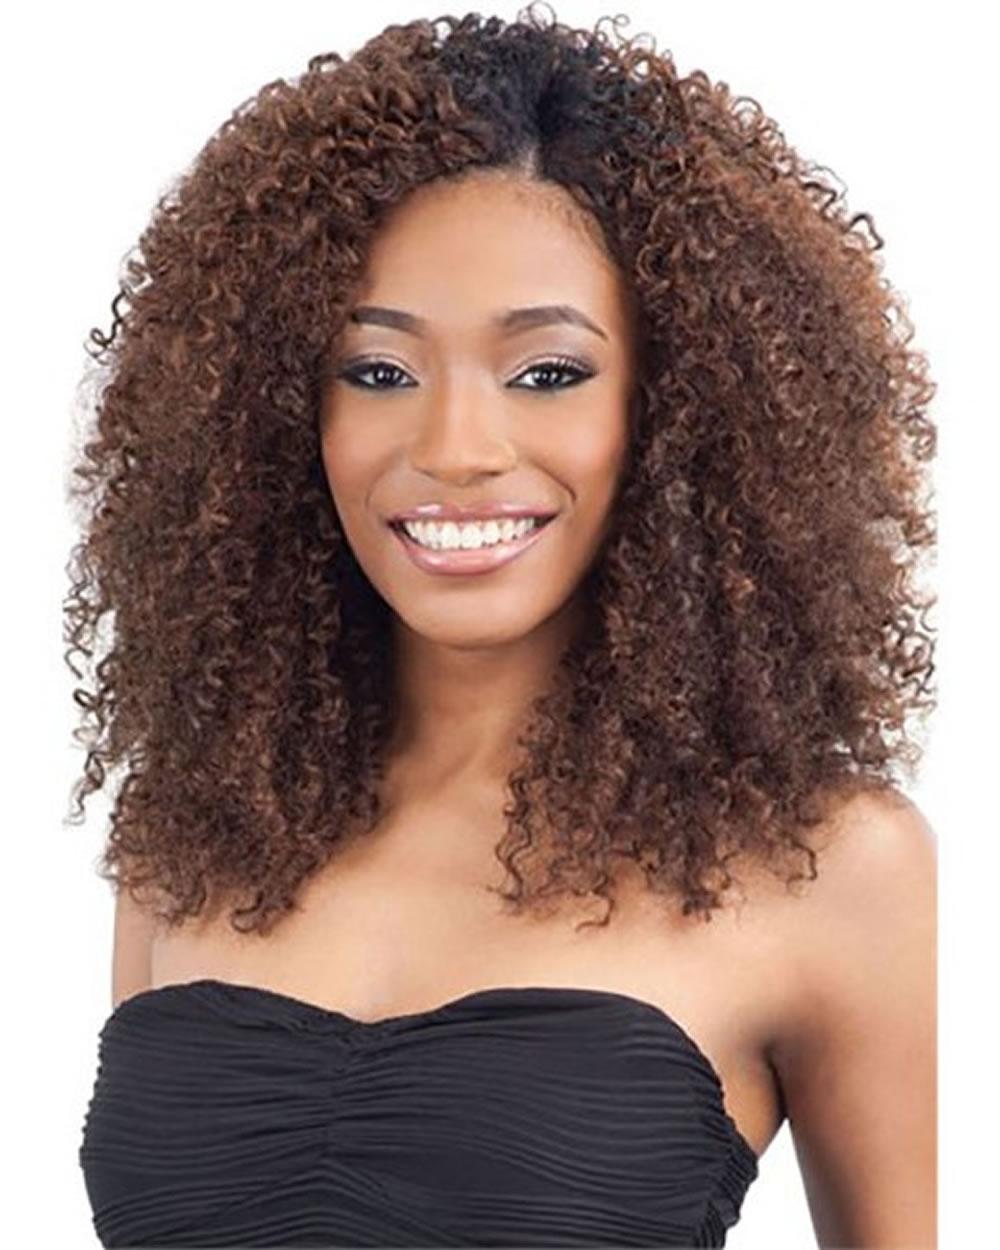 ShortNatural Hairstyles 2019 -African American Girl 2